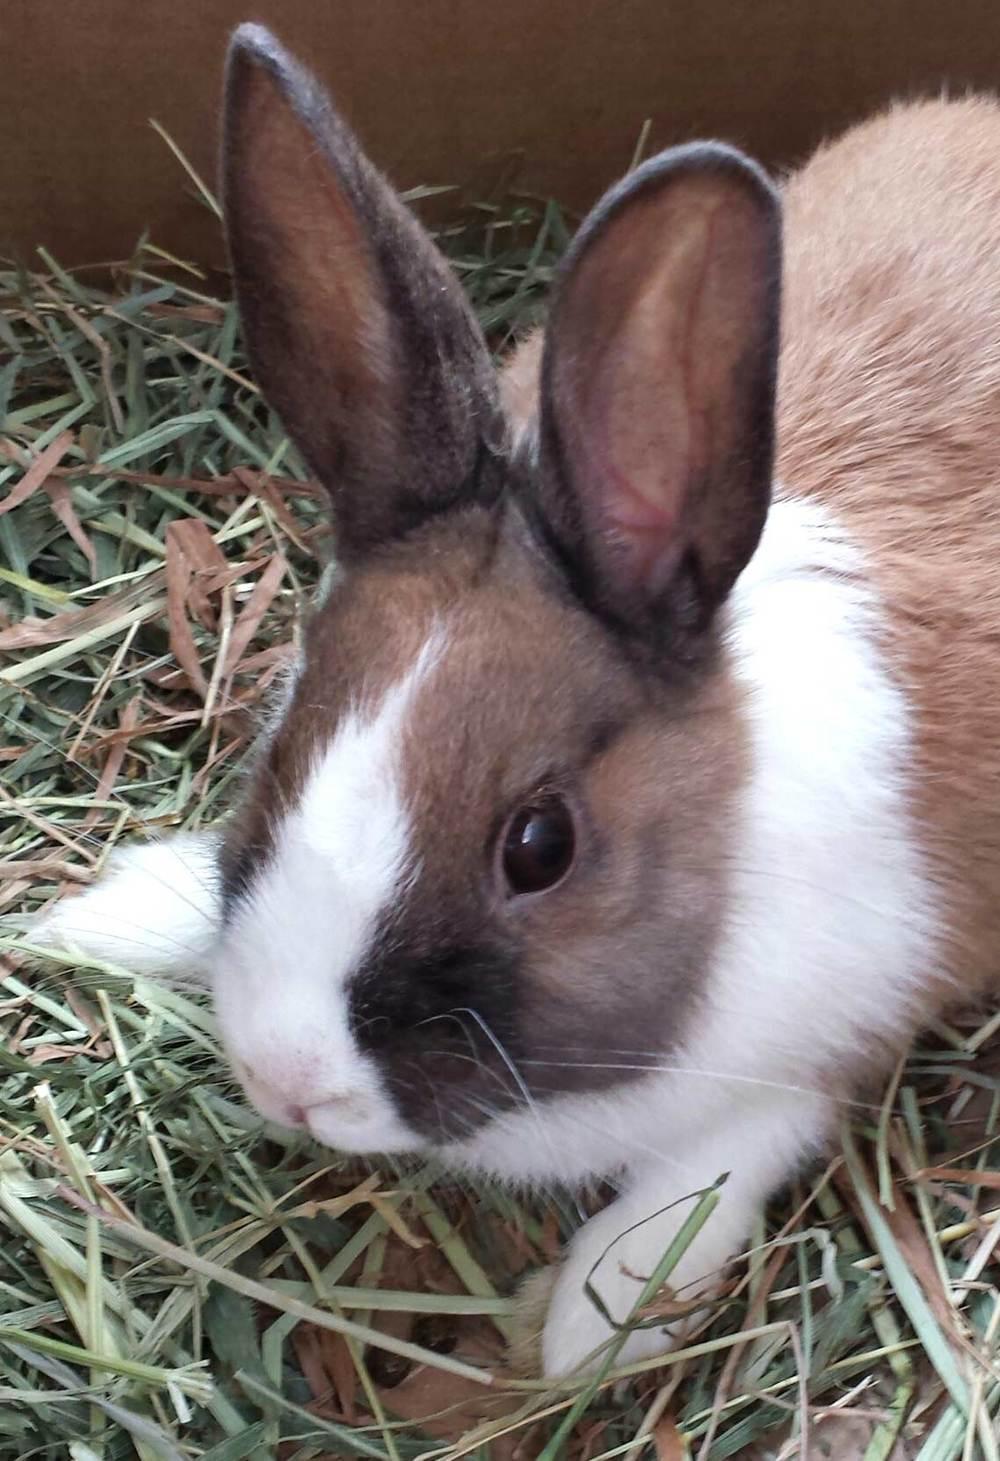 Bunny Peg leg